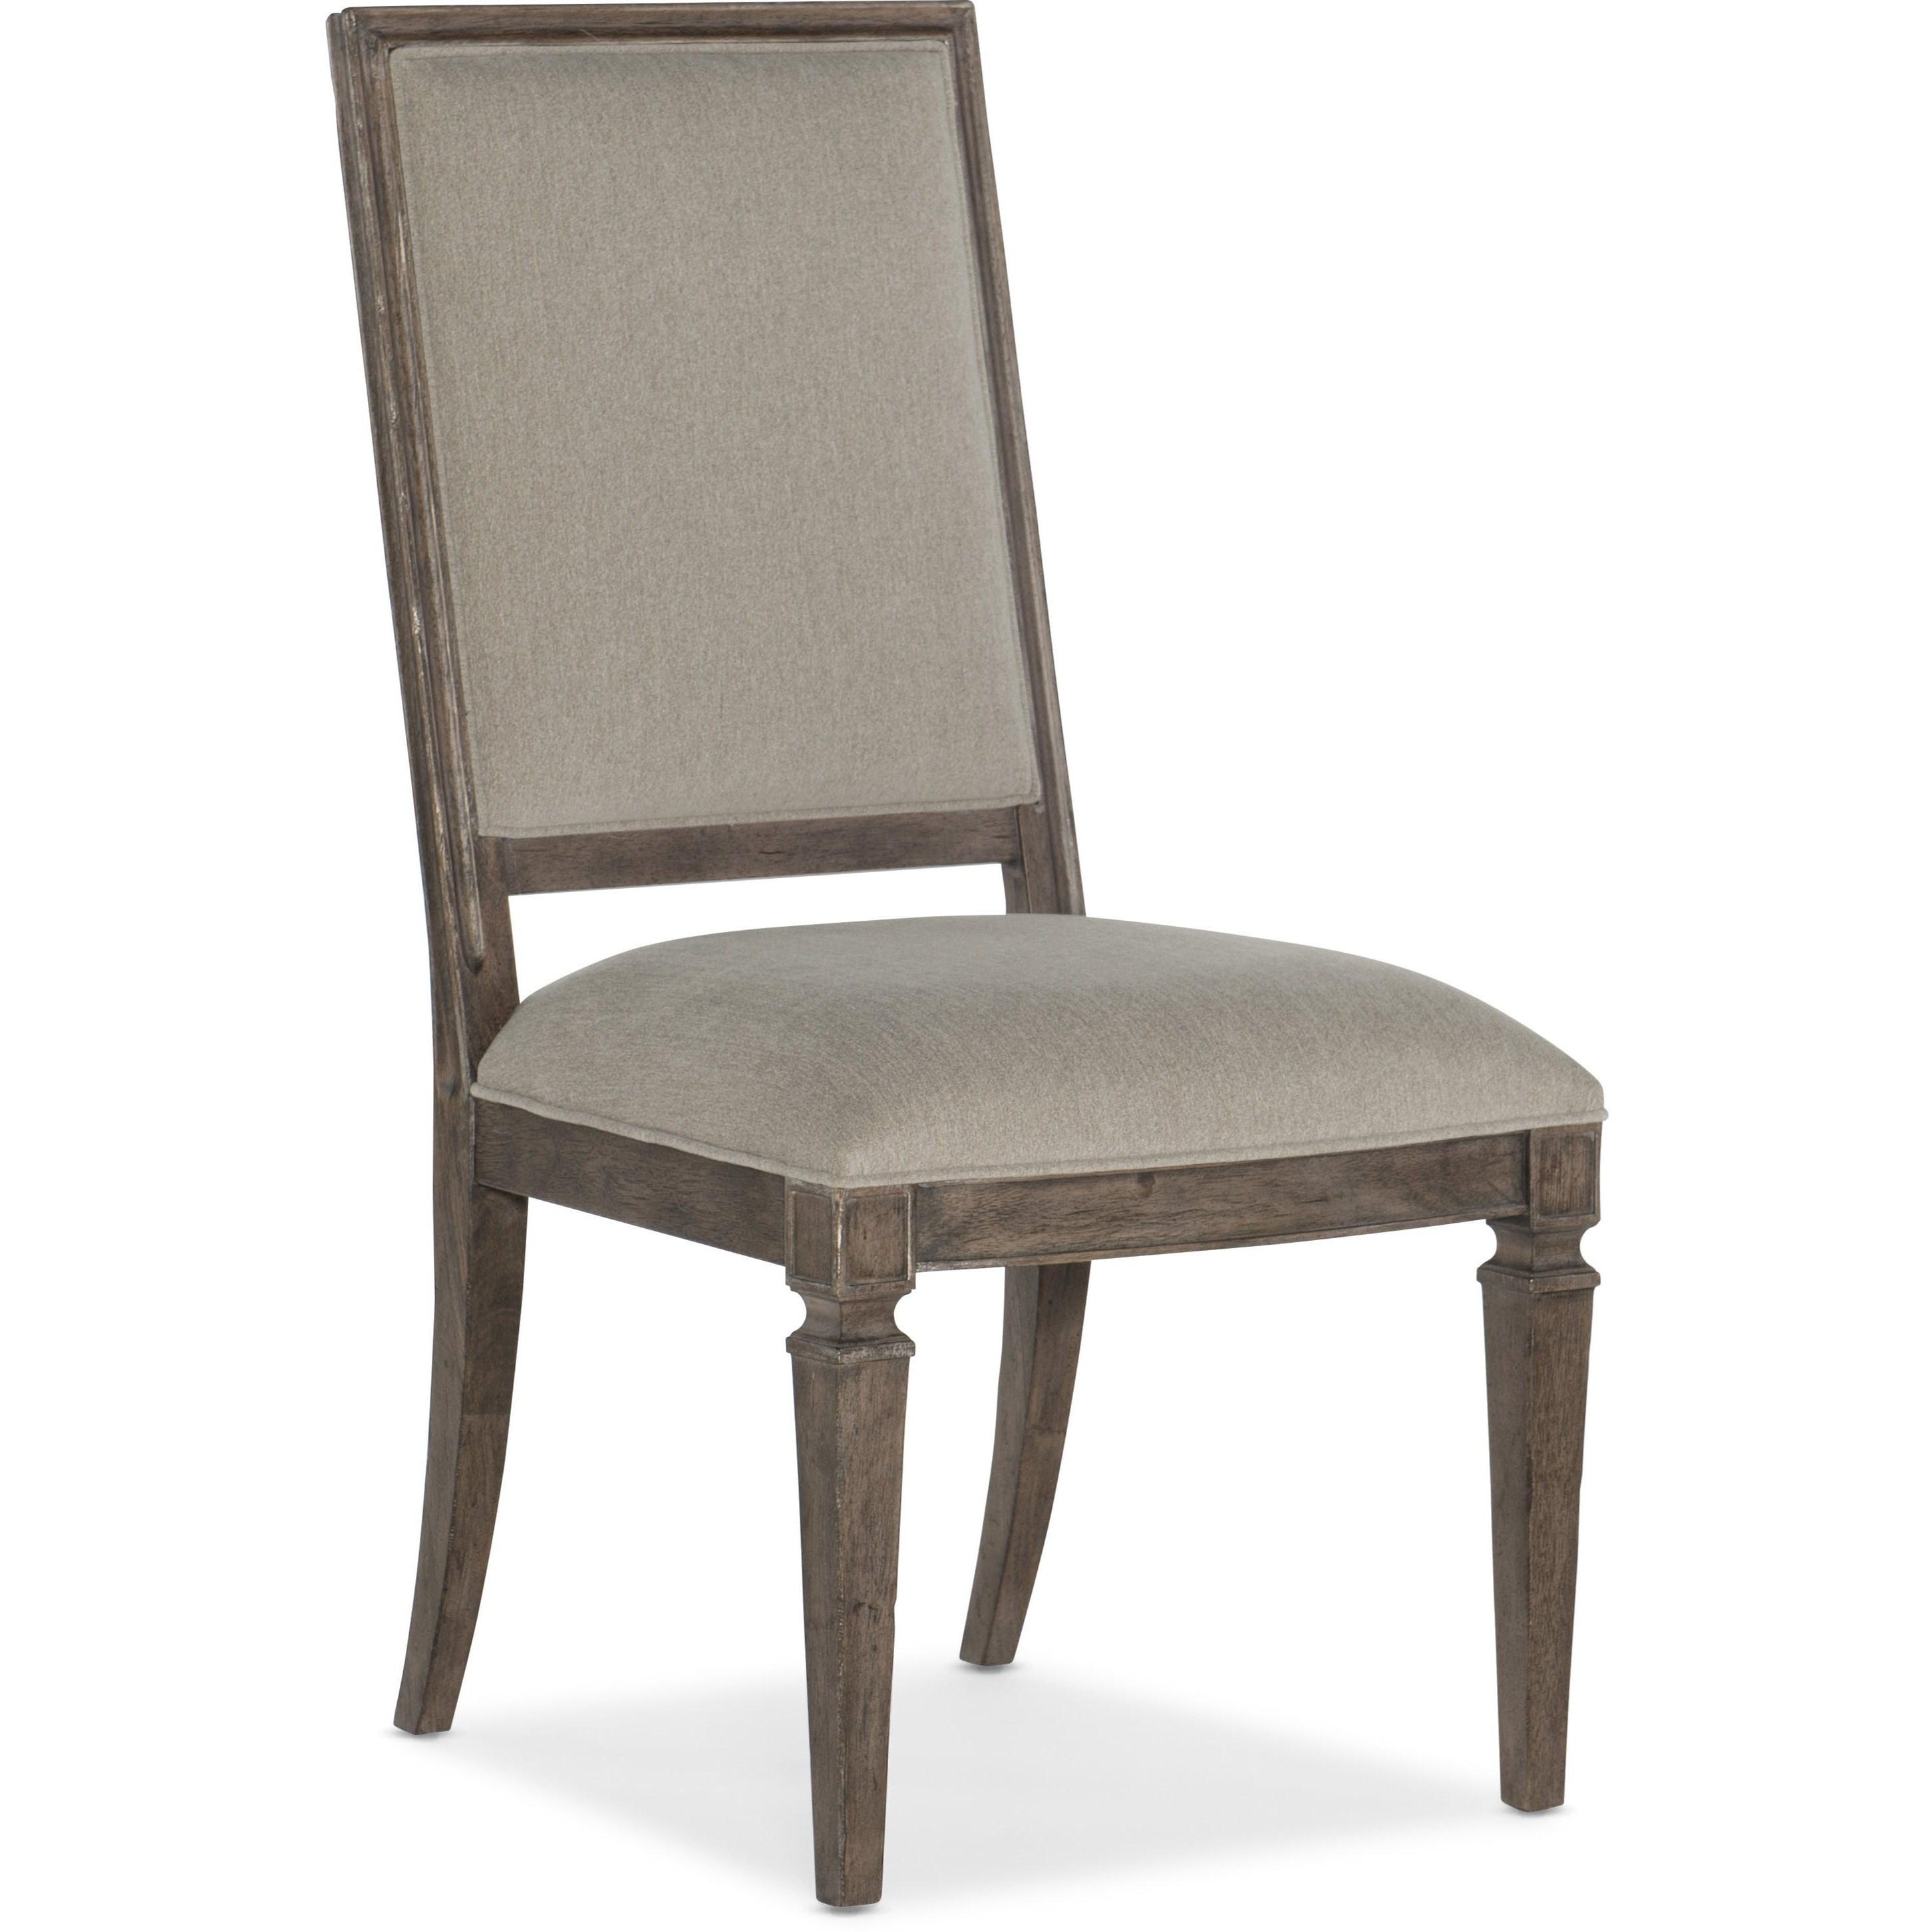 Woodlands Upholstered Side Chair by Hooker Furniture at Baer's Furniture